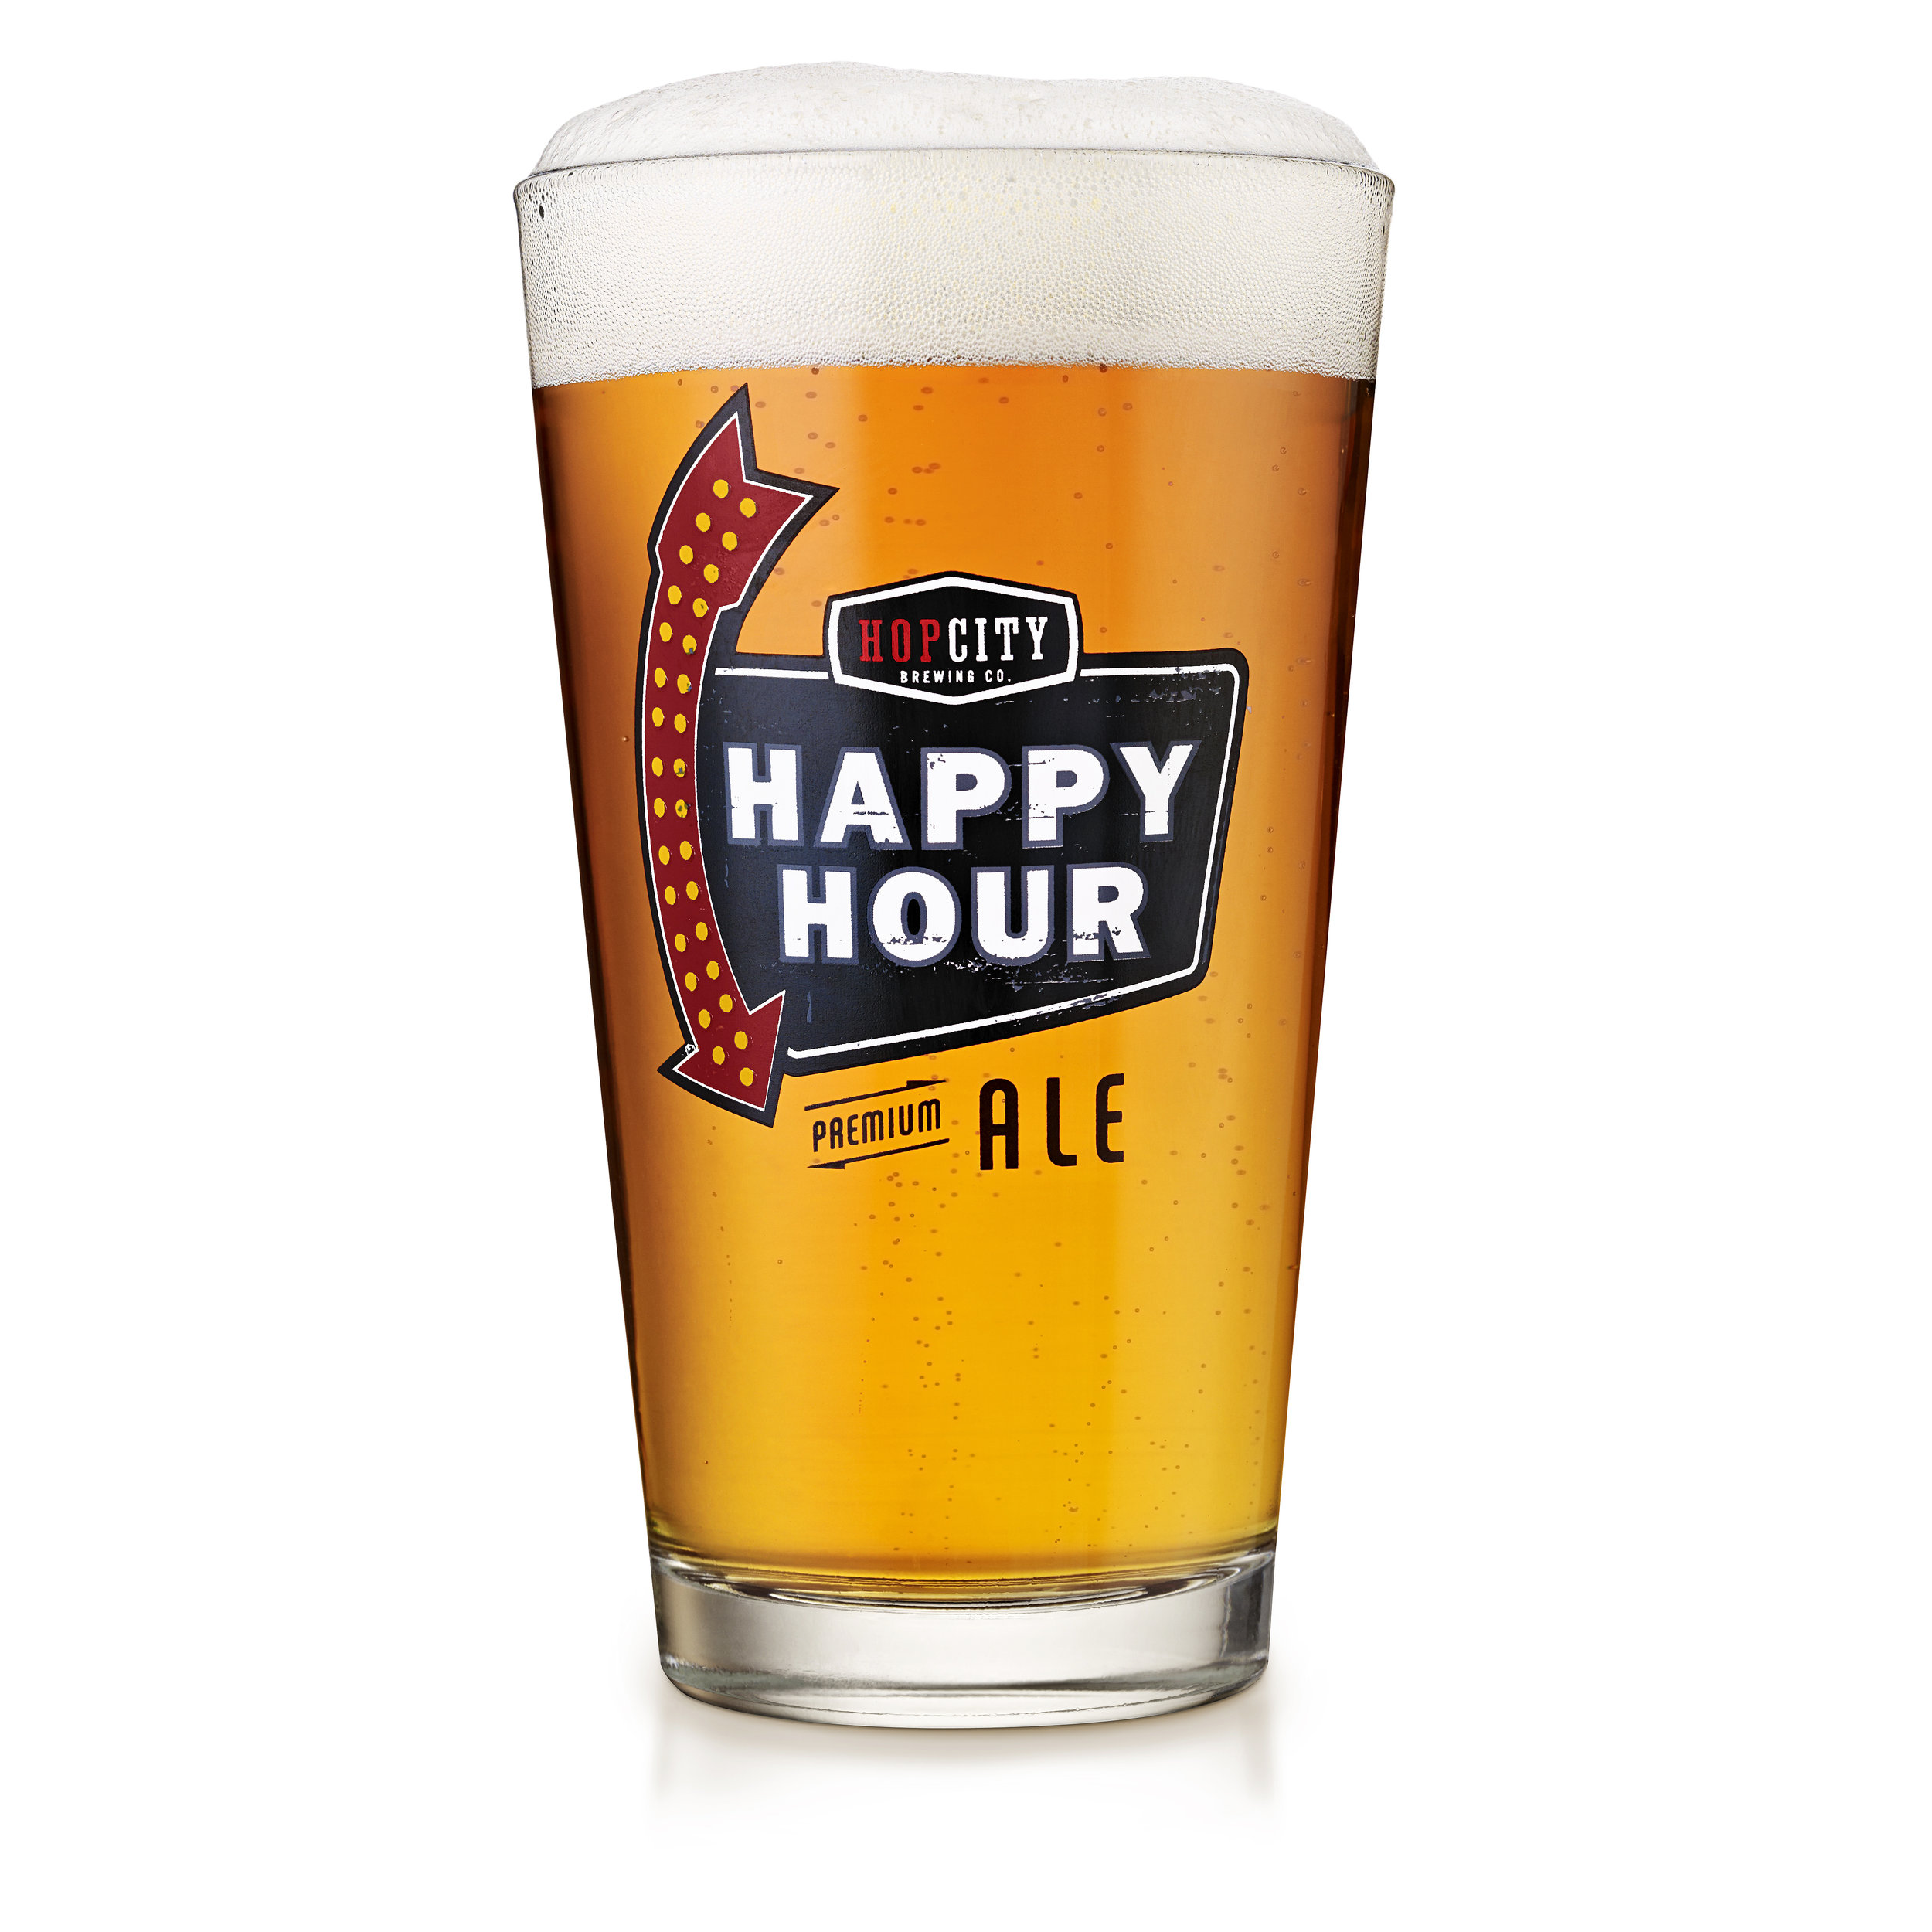 CVFX_PORT_Happy Hour_mstr_CJI_WEB.jpg